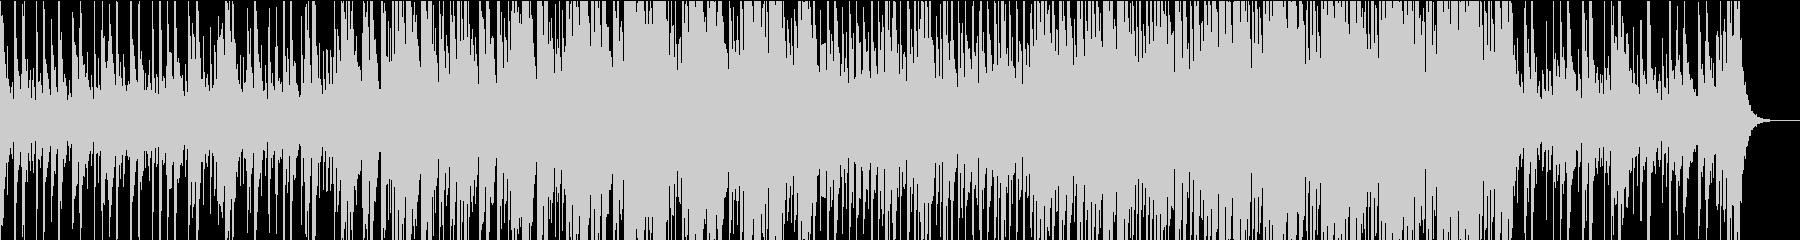 Drumsの未再生の波形